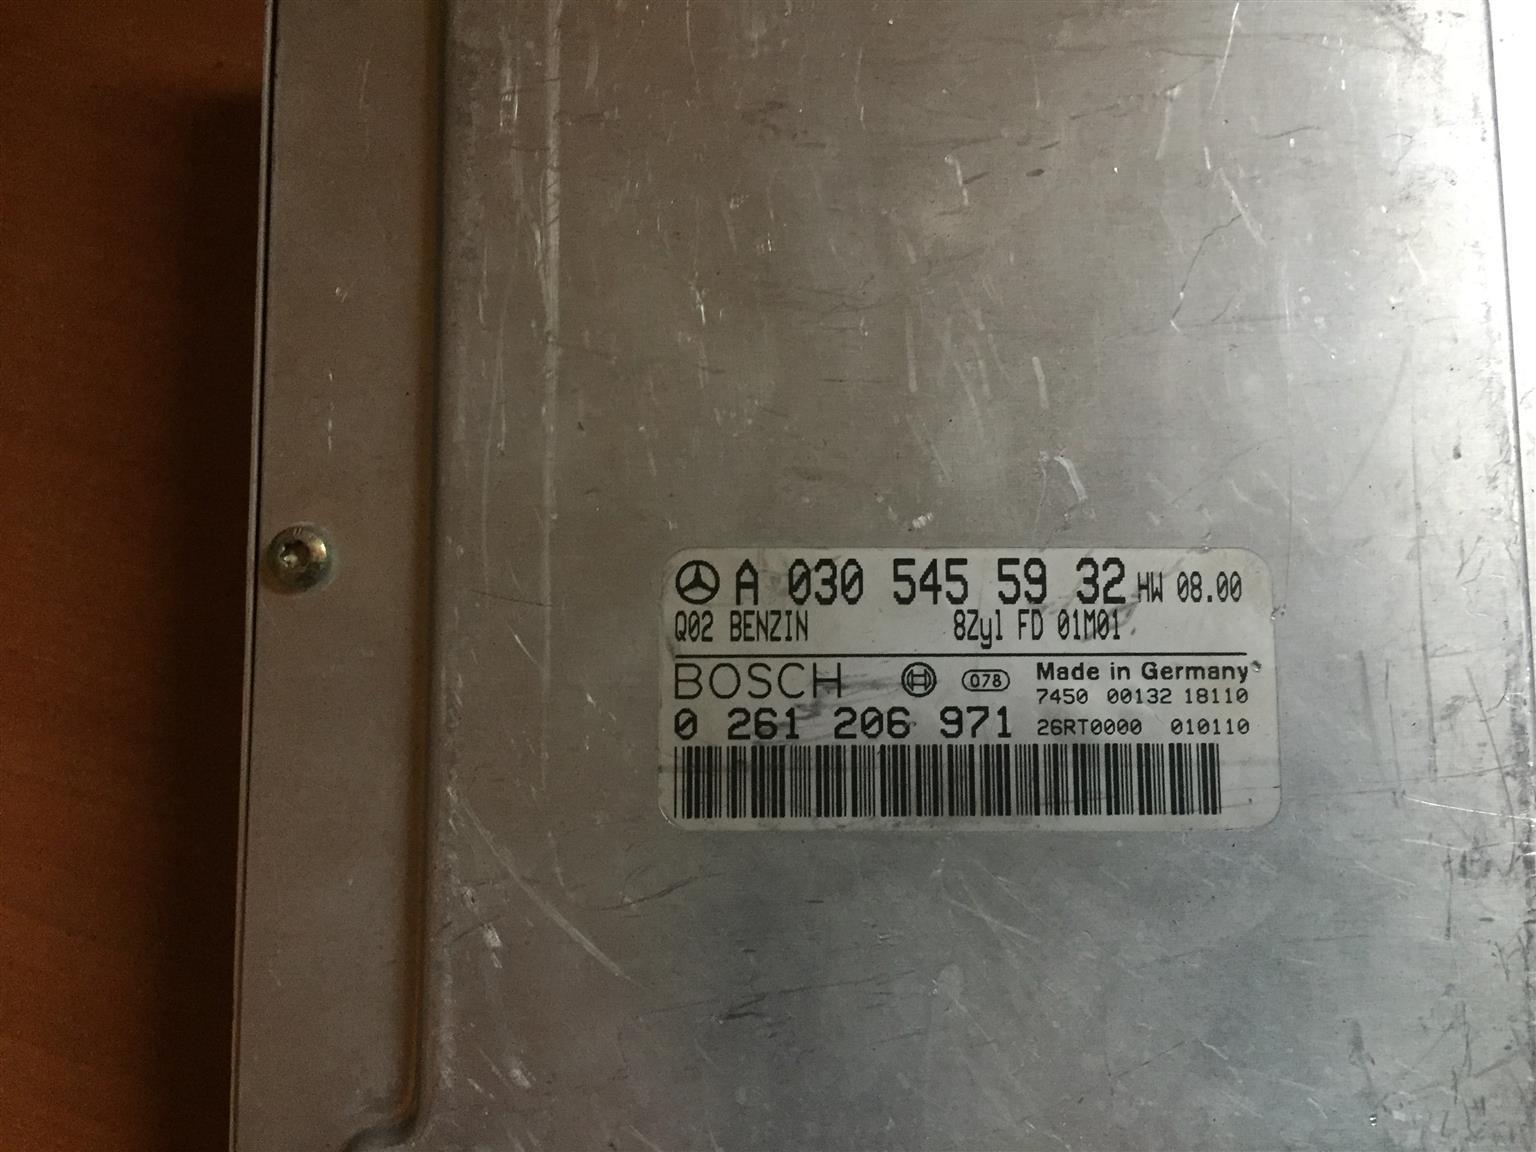 Mercedes Benz computer box for sale